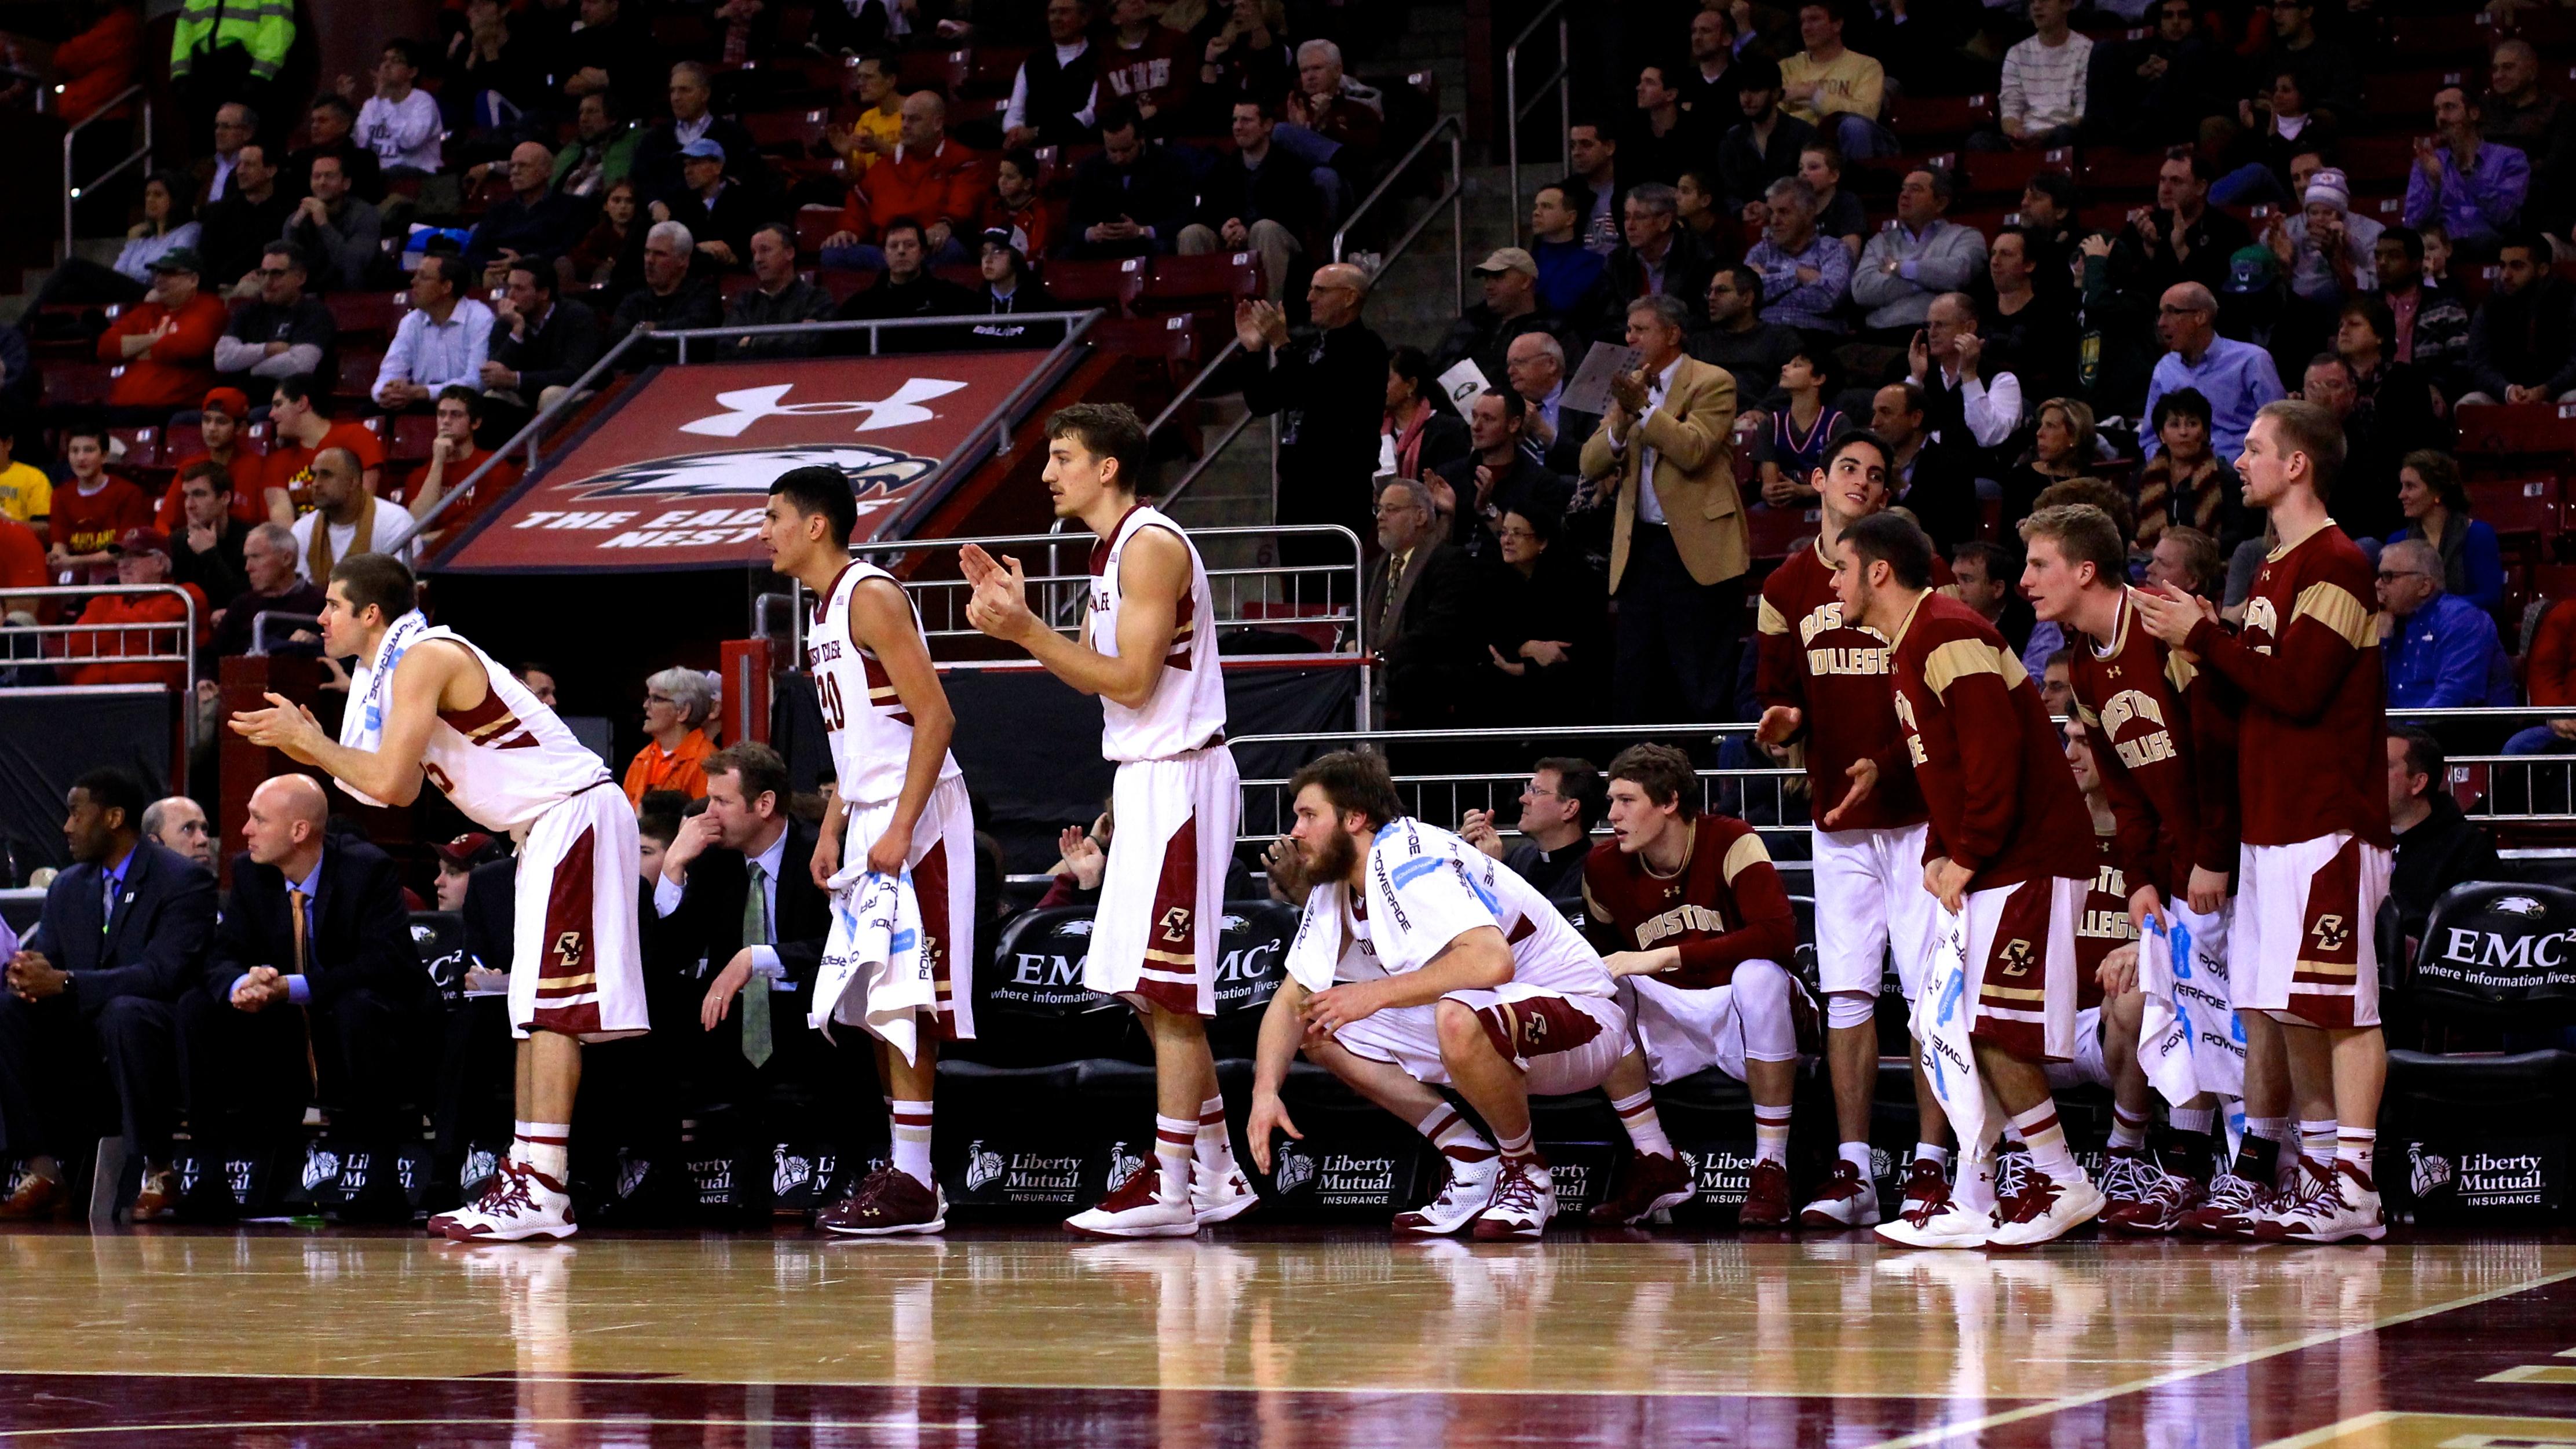 musta previewing bc basketball - HD4447×2501